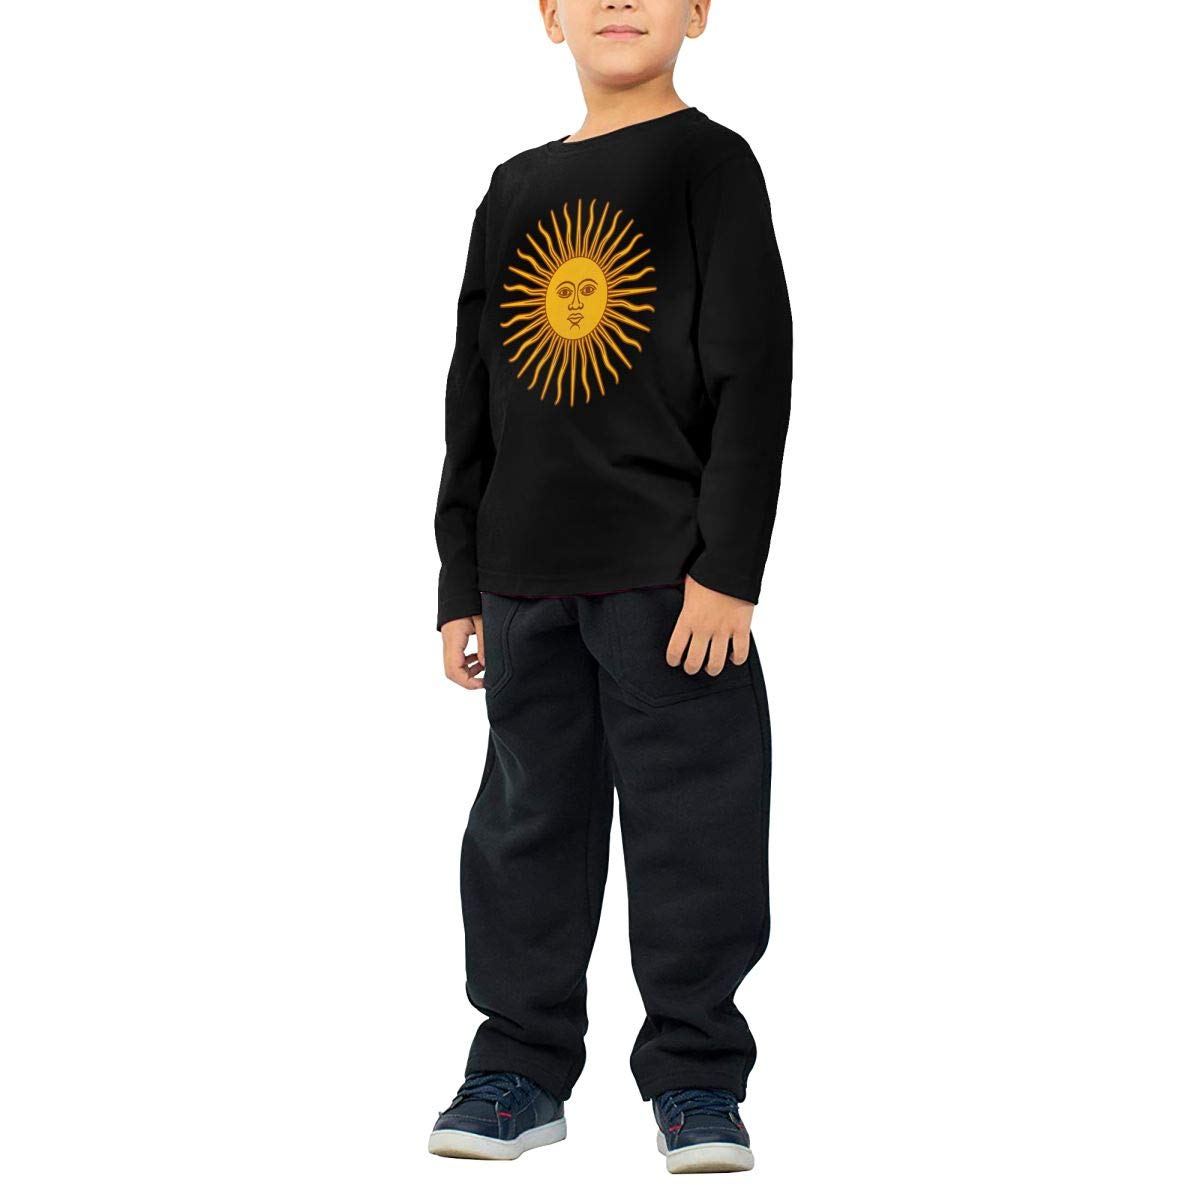 Toddler Argentina Sun ComfortSoft Long Sleeve T-Shirt